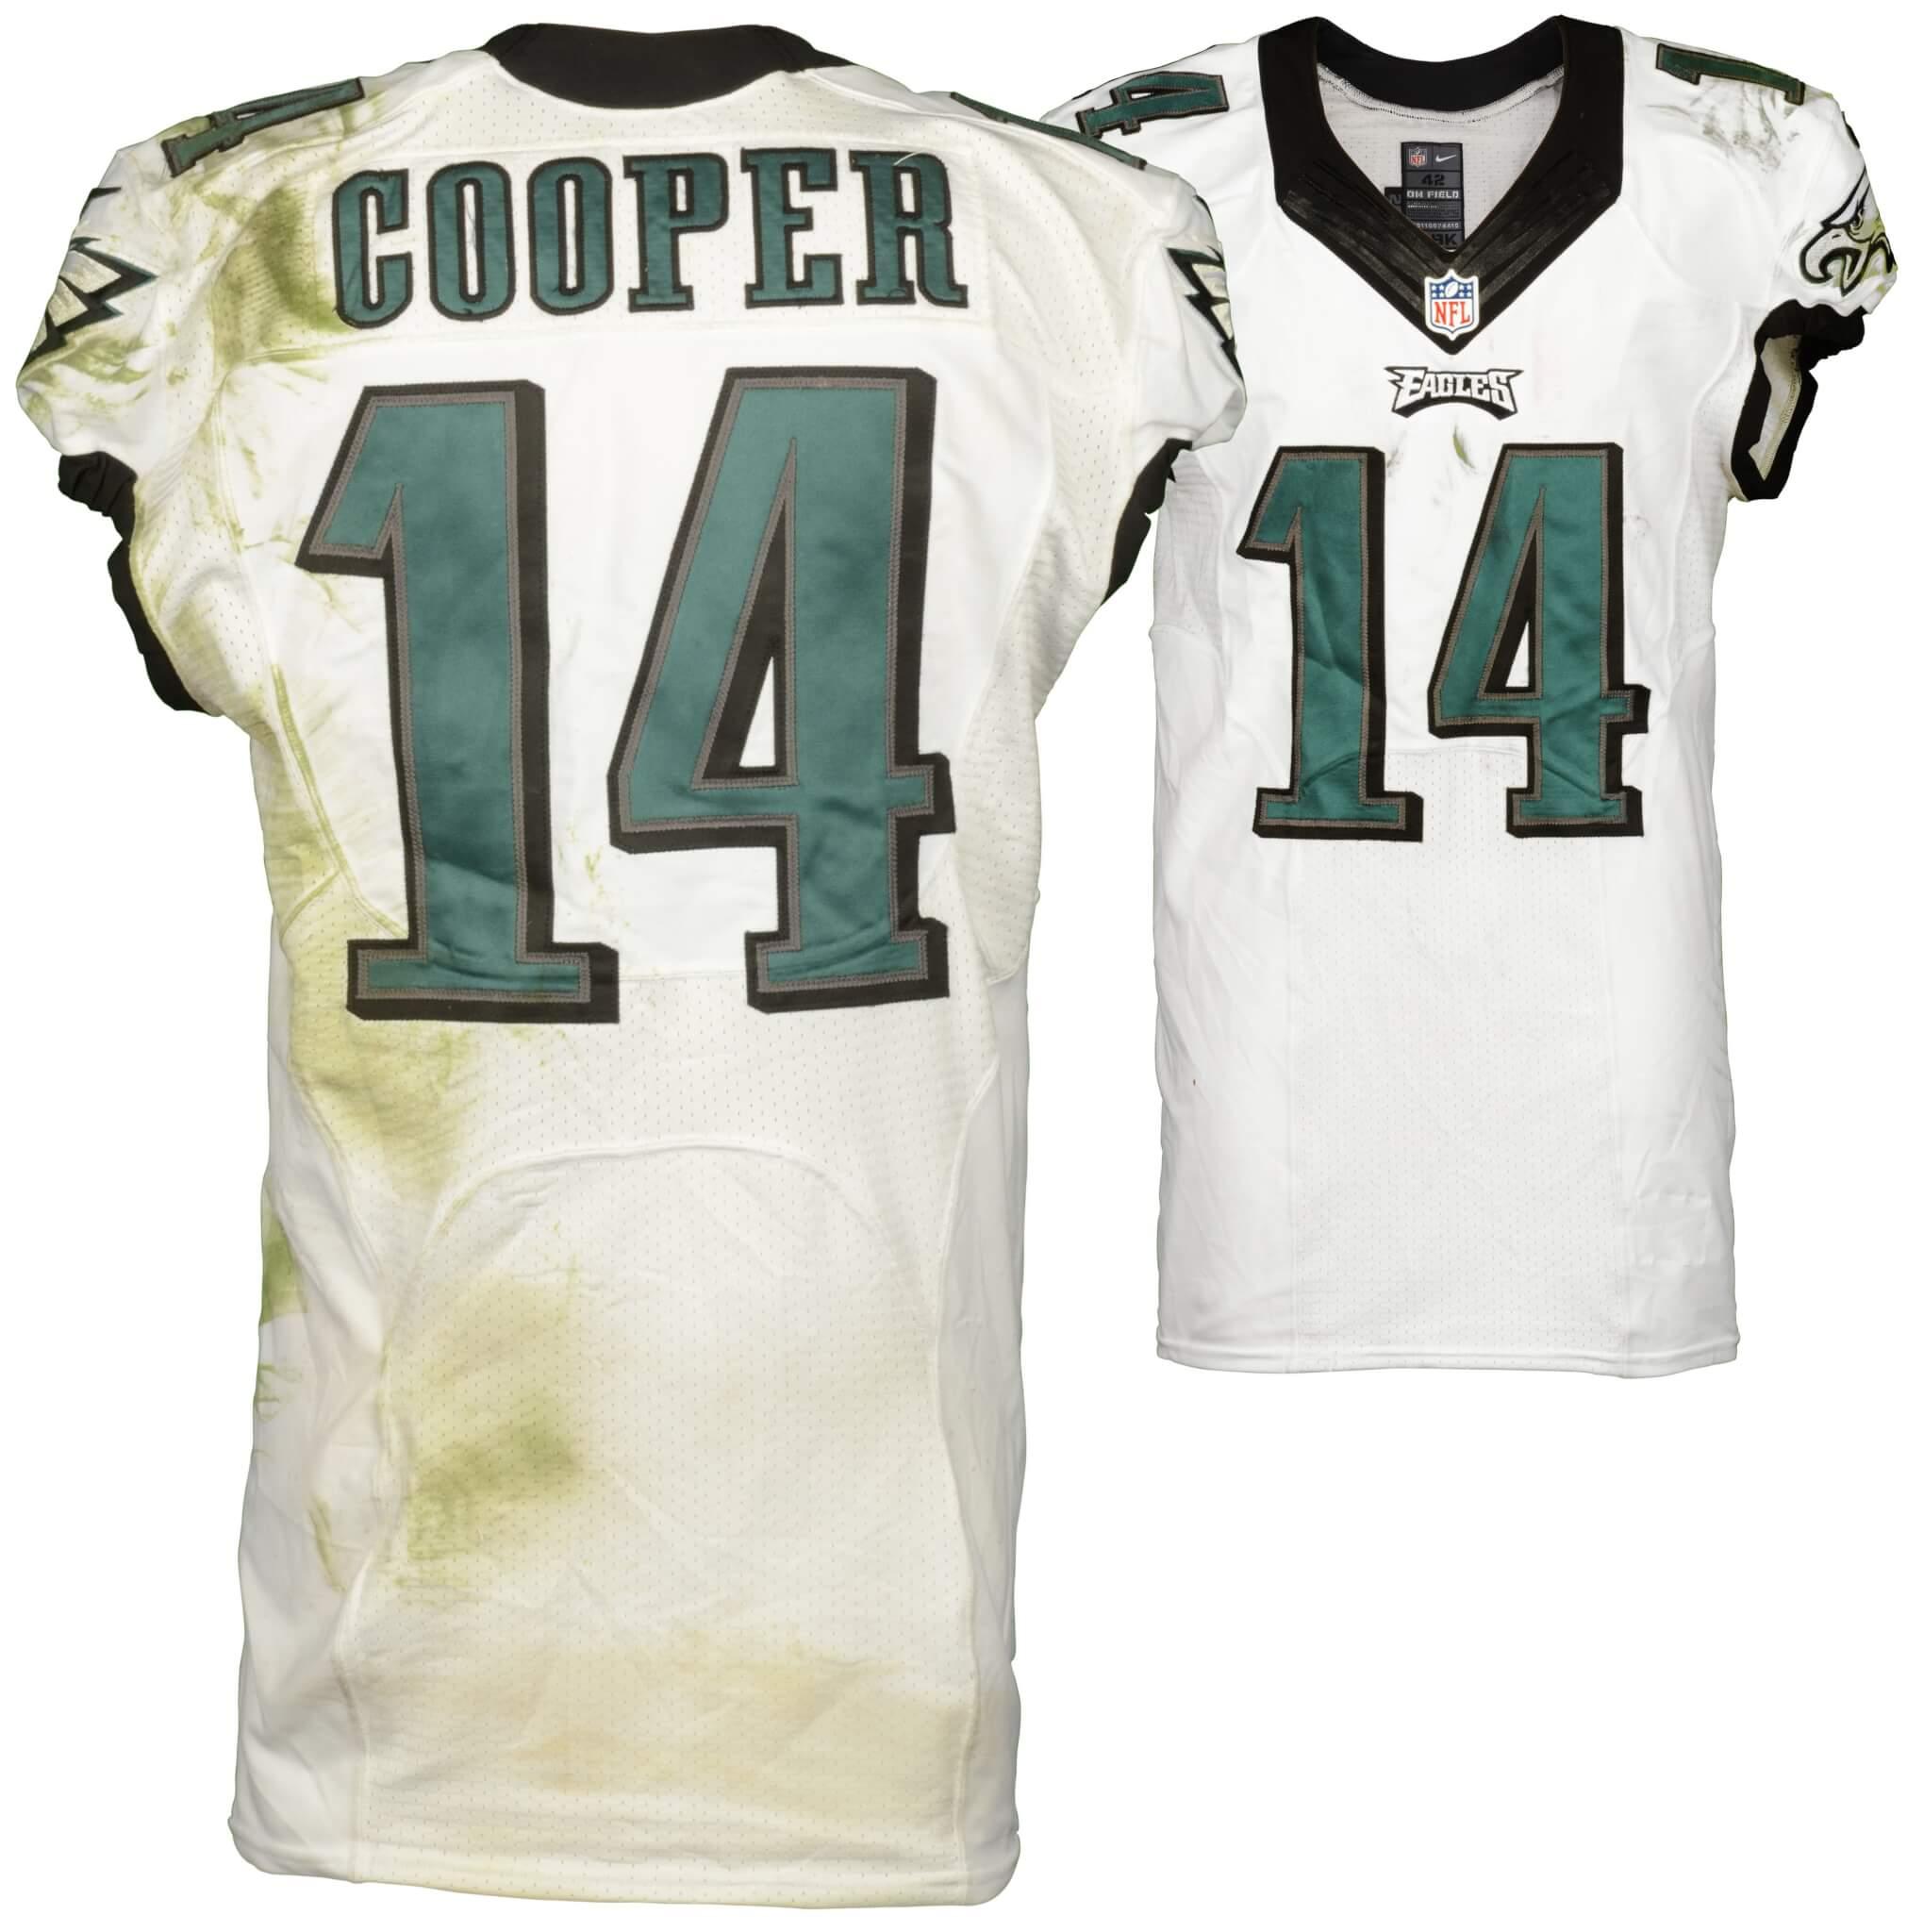 riley cooper jersey